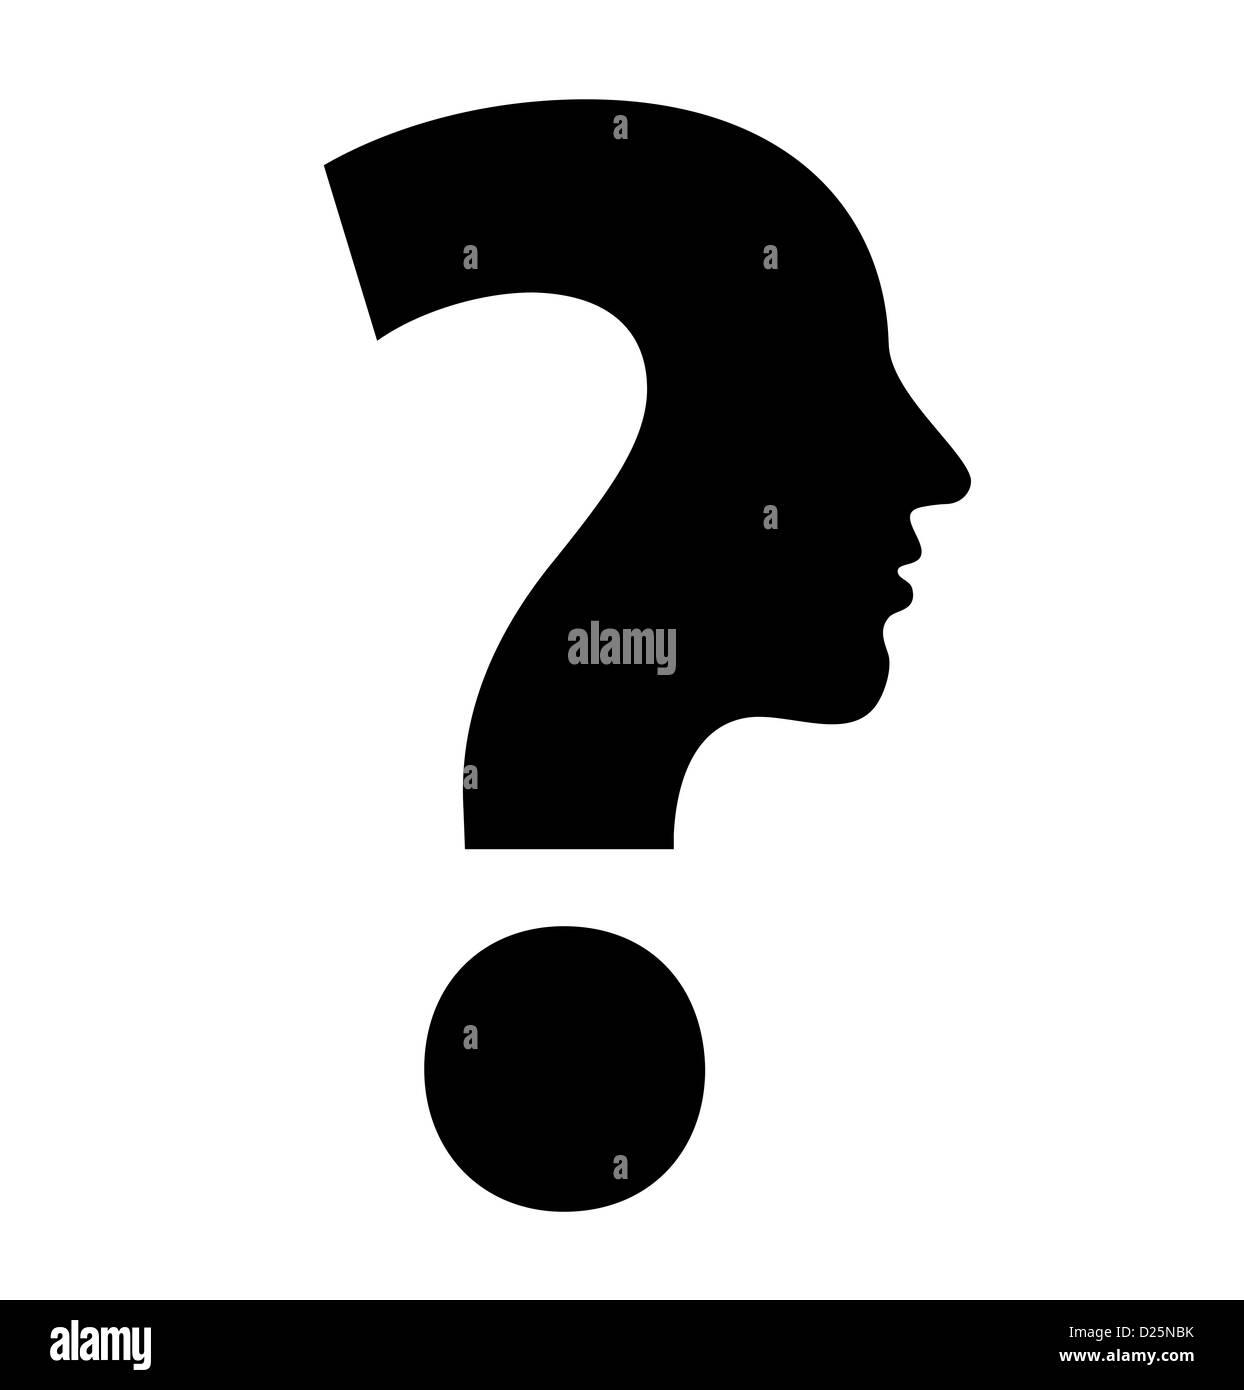 creative question mark - Stock Image